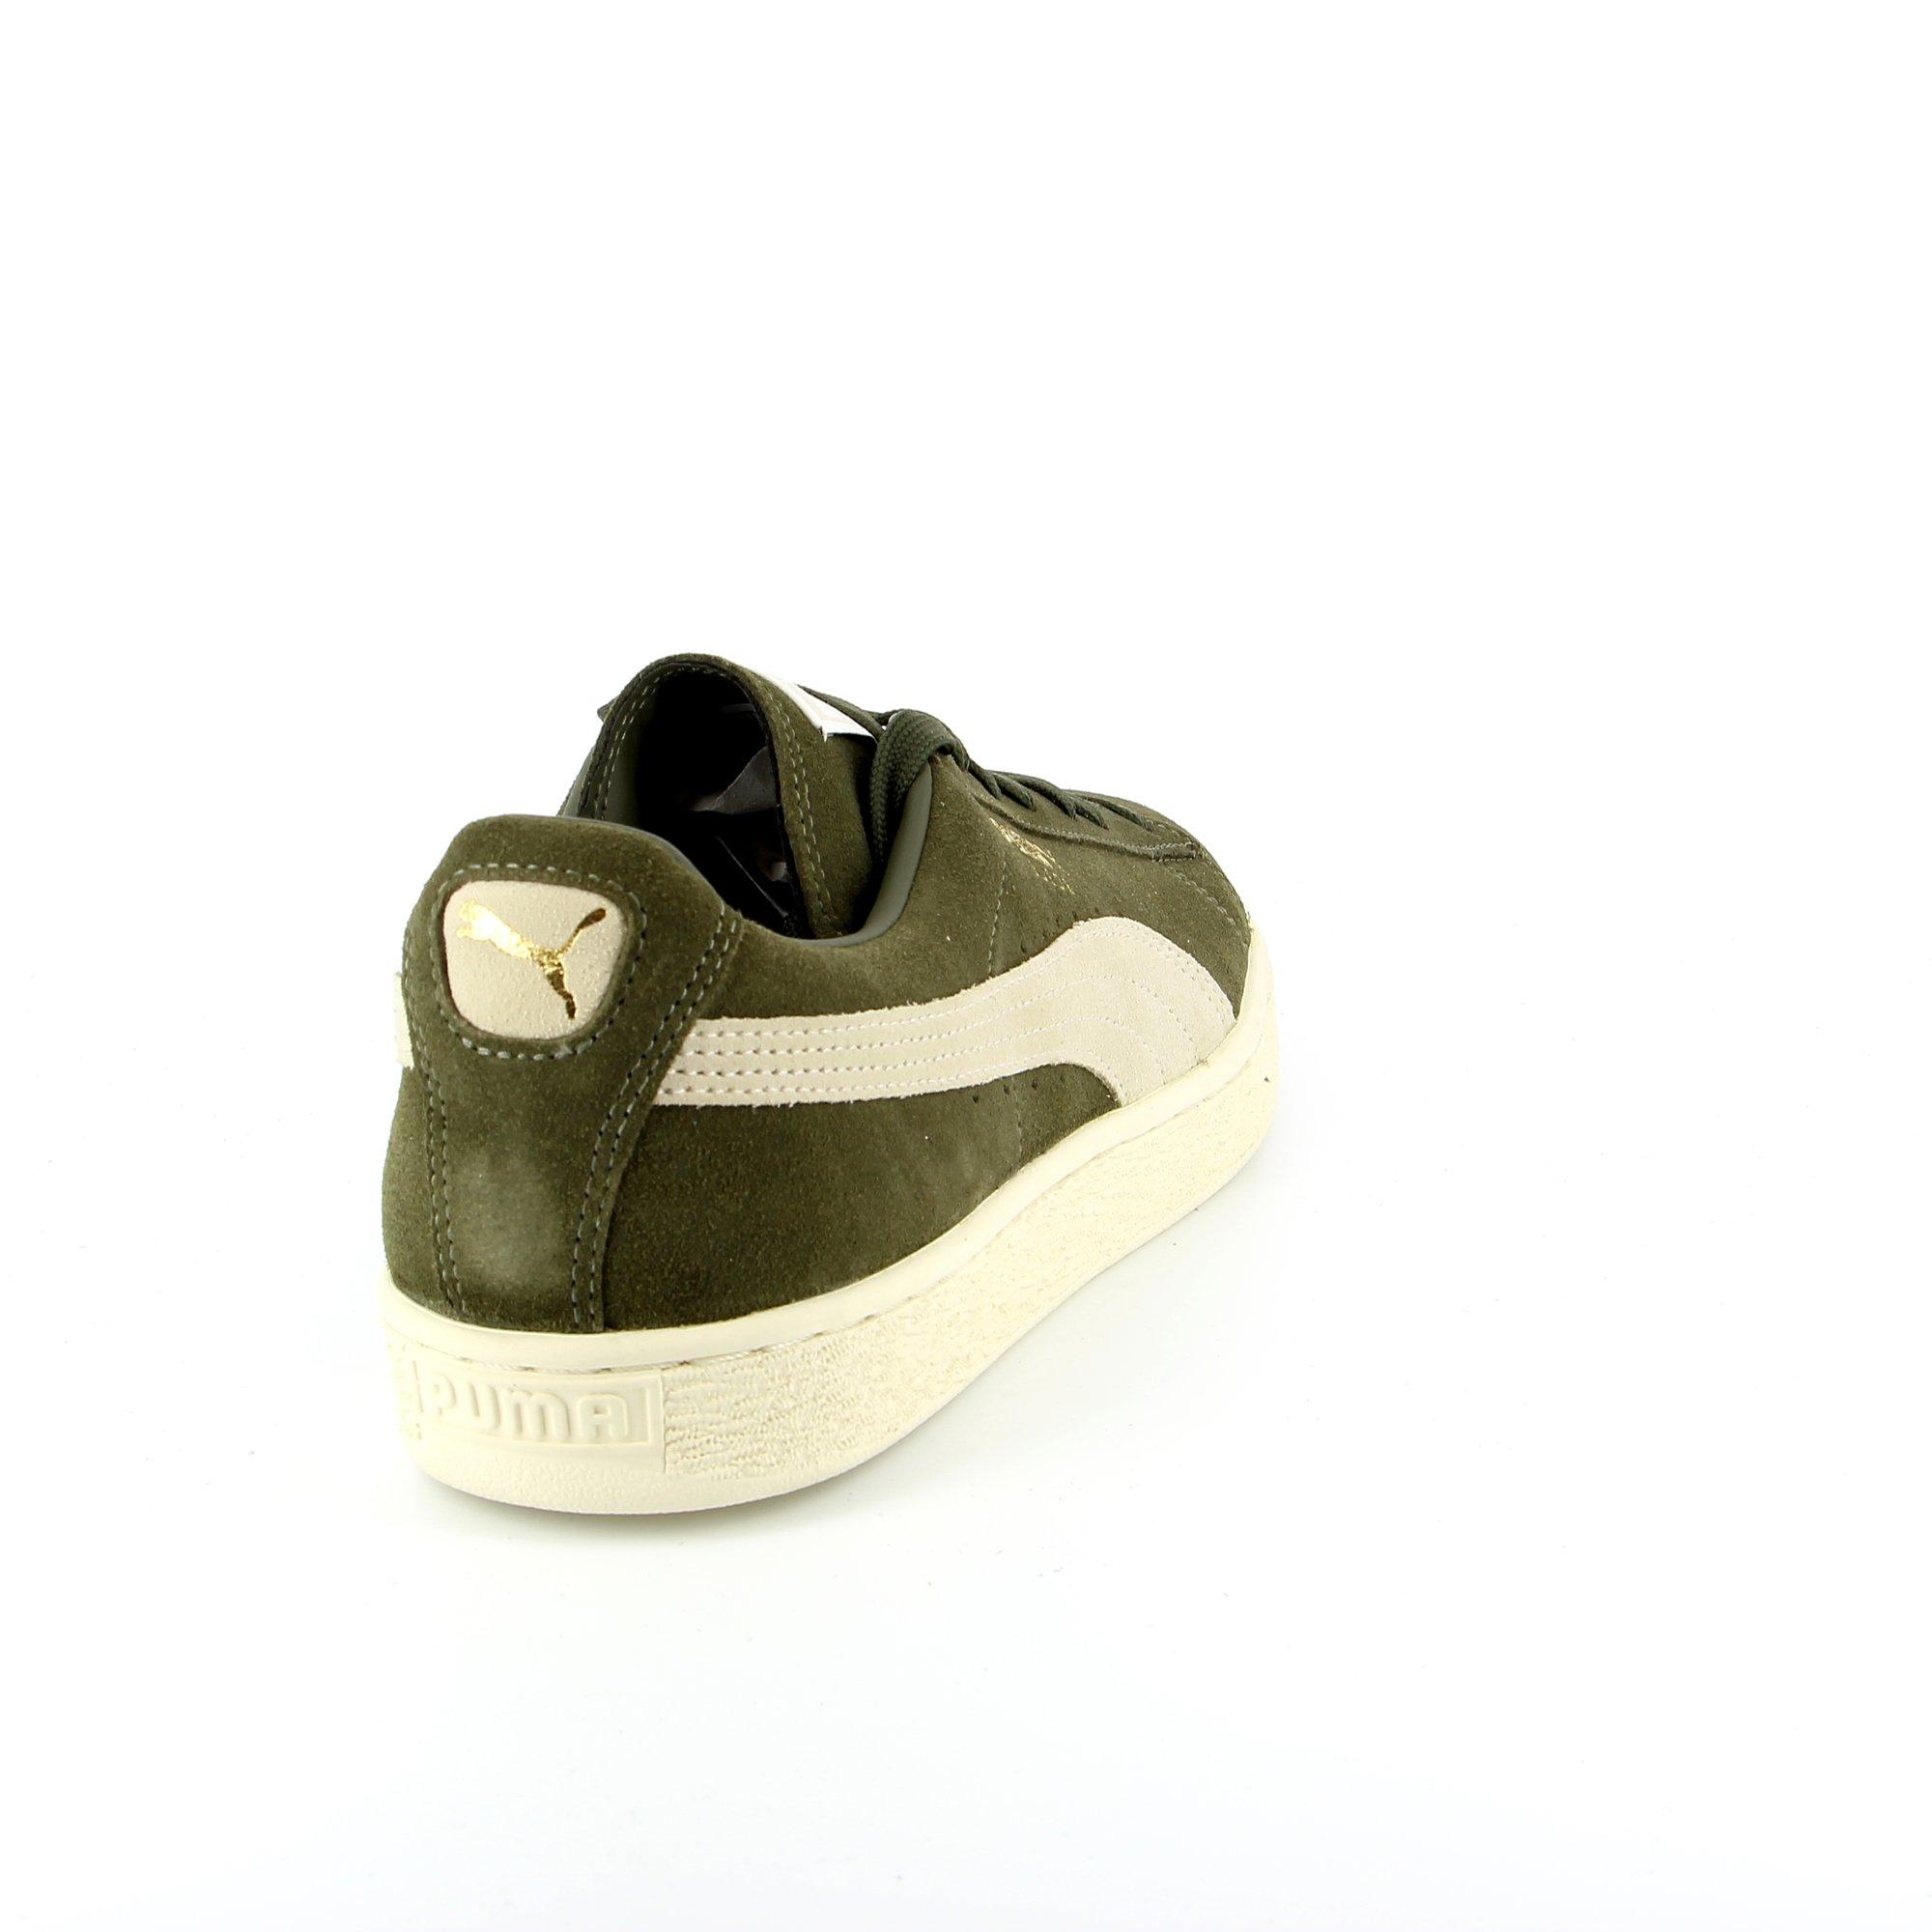 Puma Basket kaki